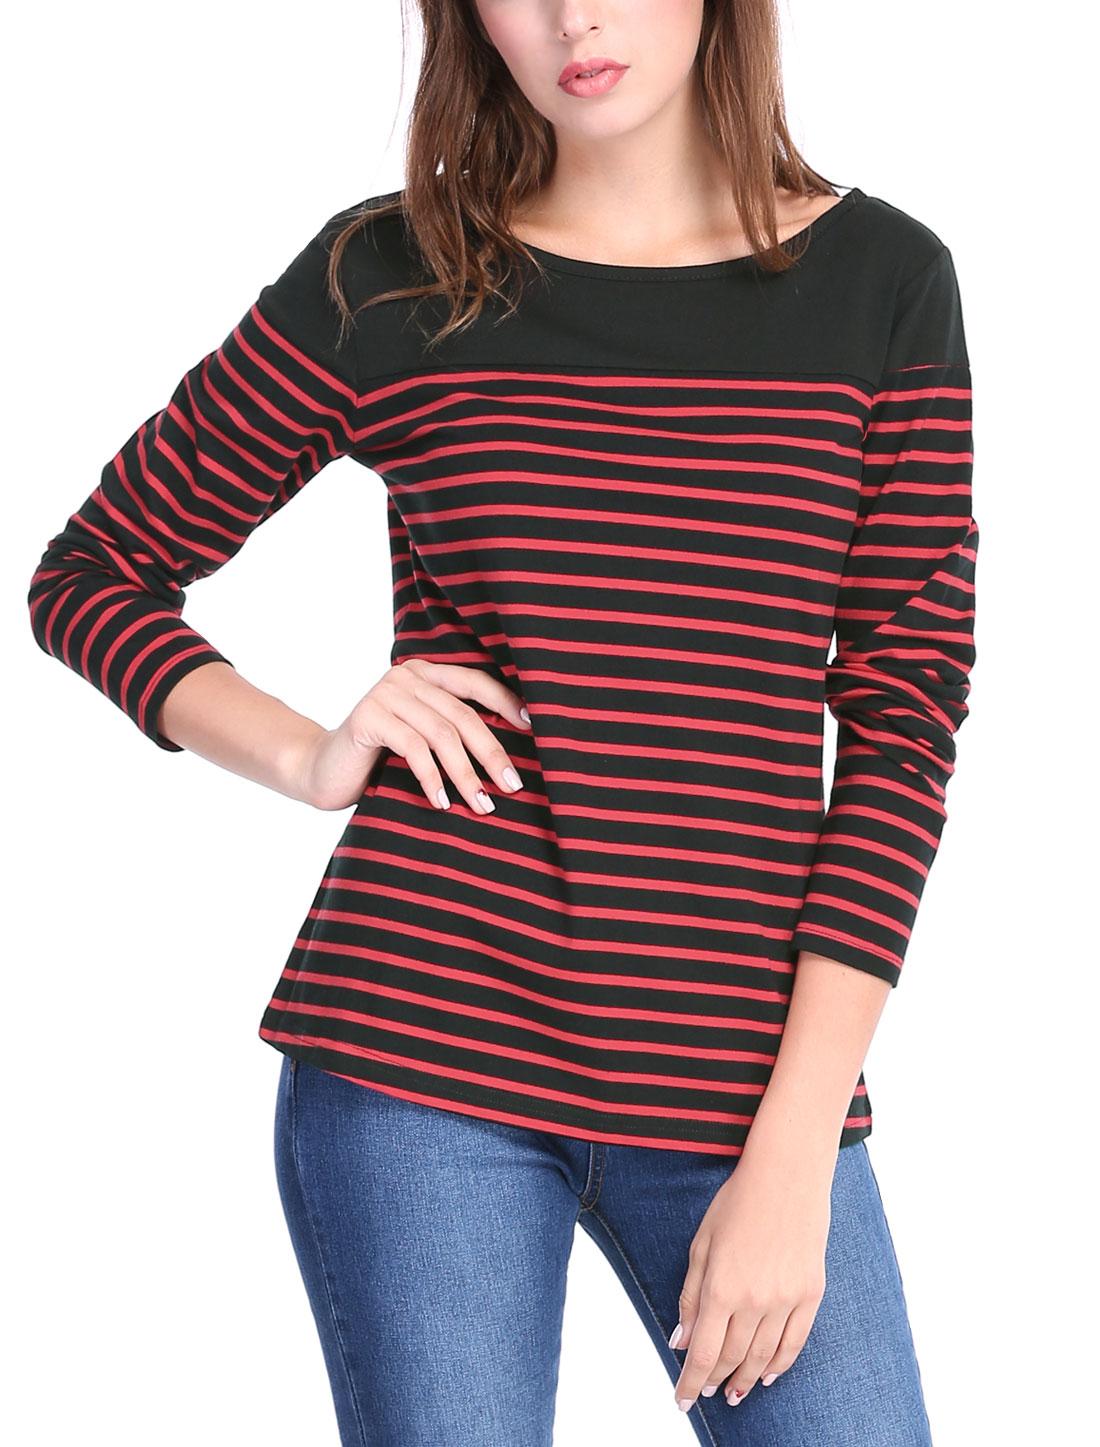 Allegra K Women Classic Striped Long Sleeves Stretch T-Shirt Black Red S